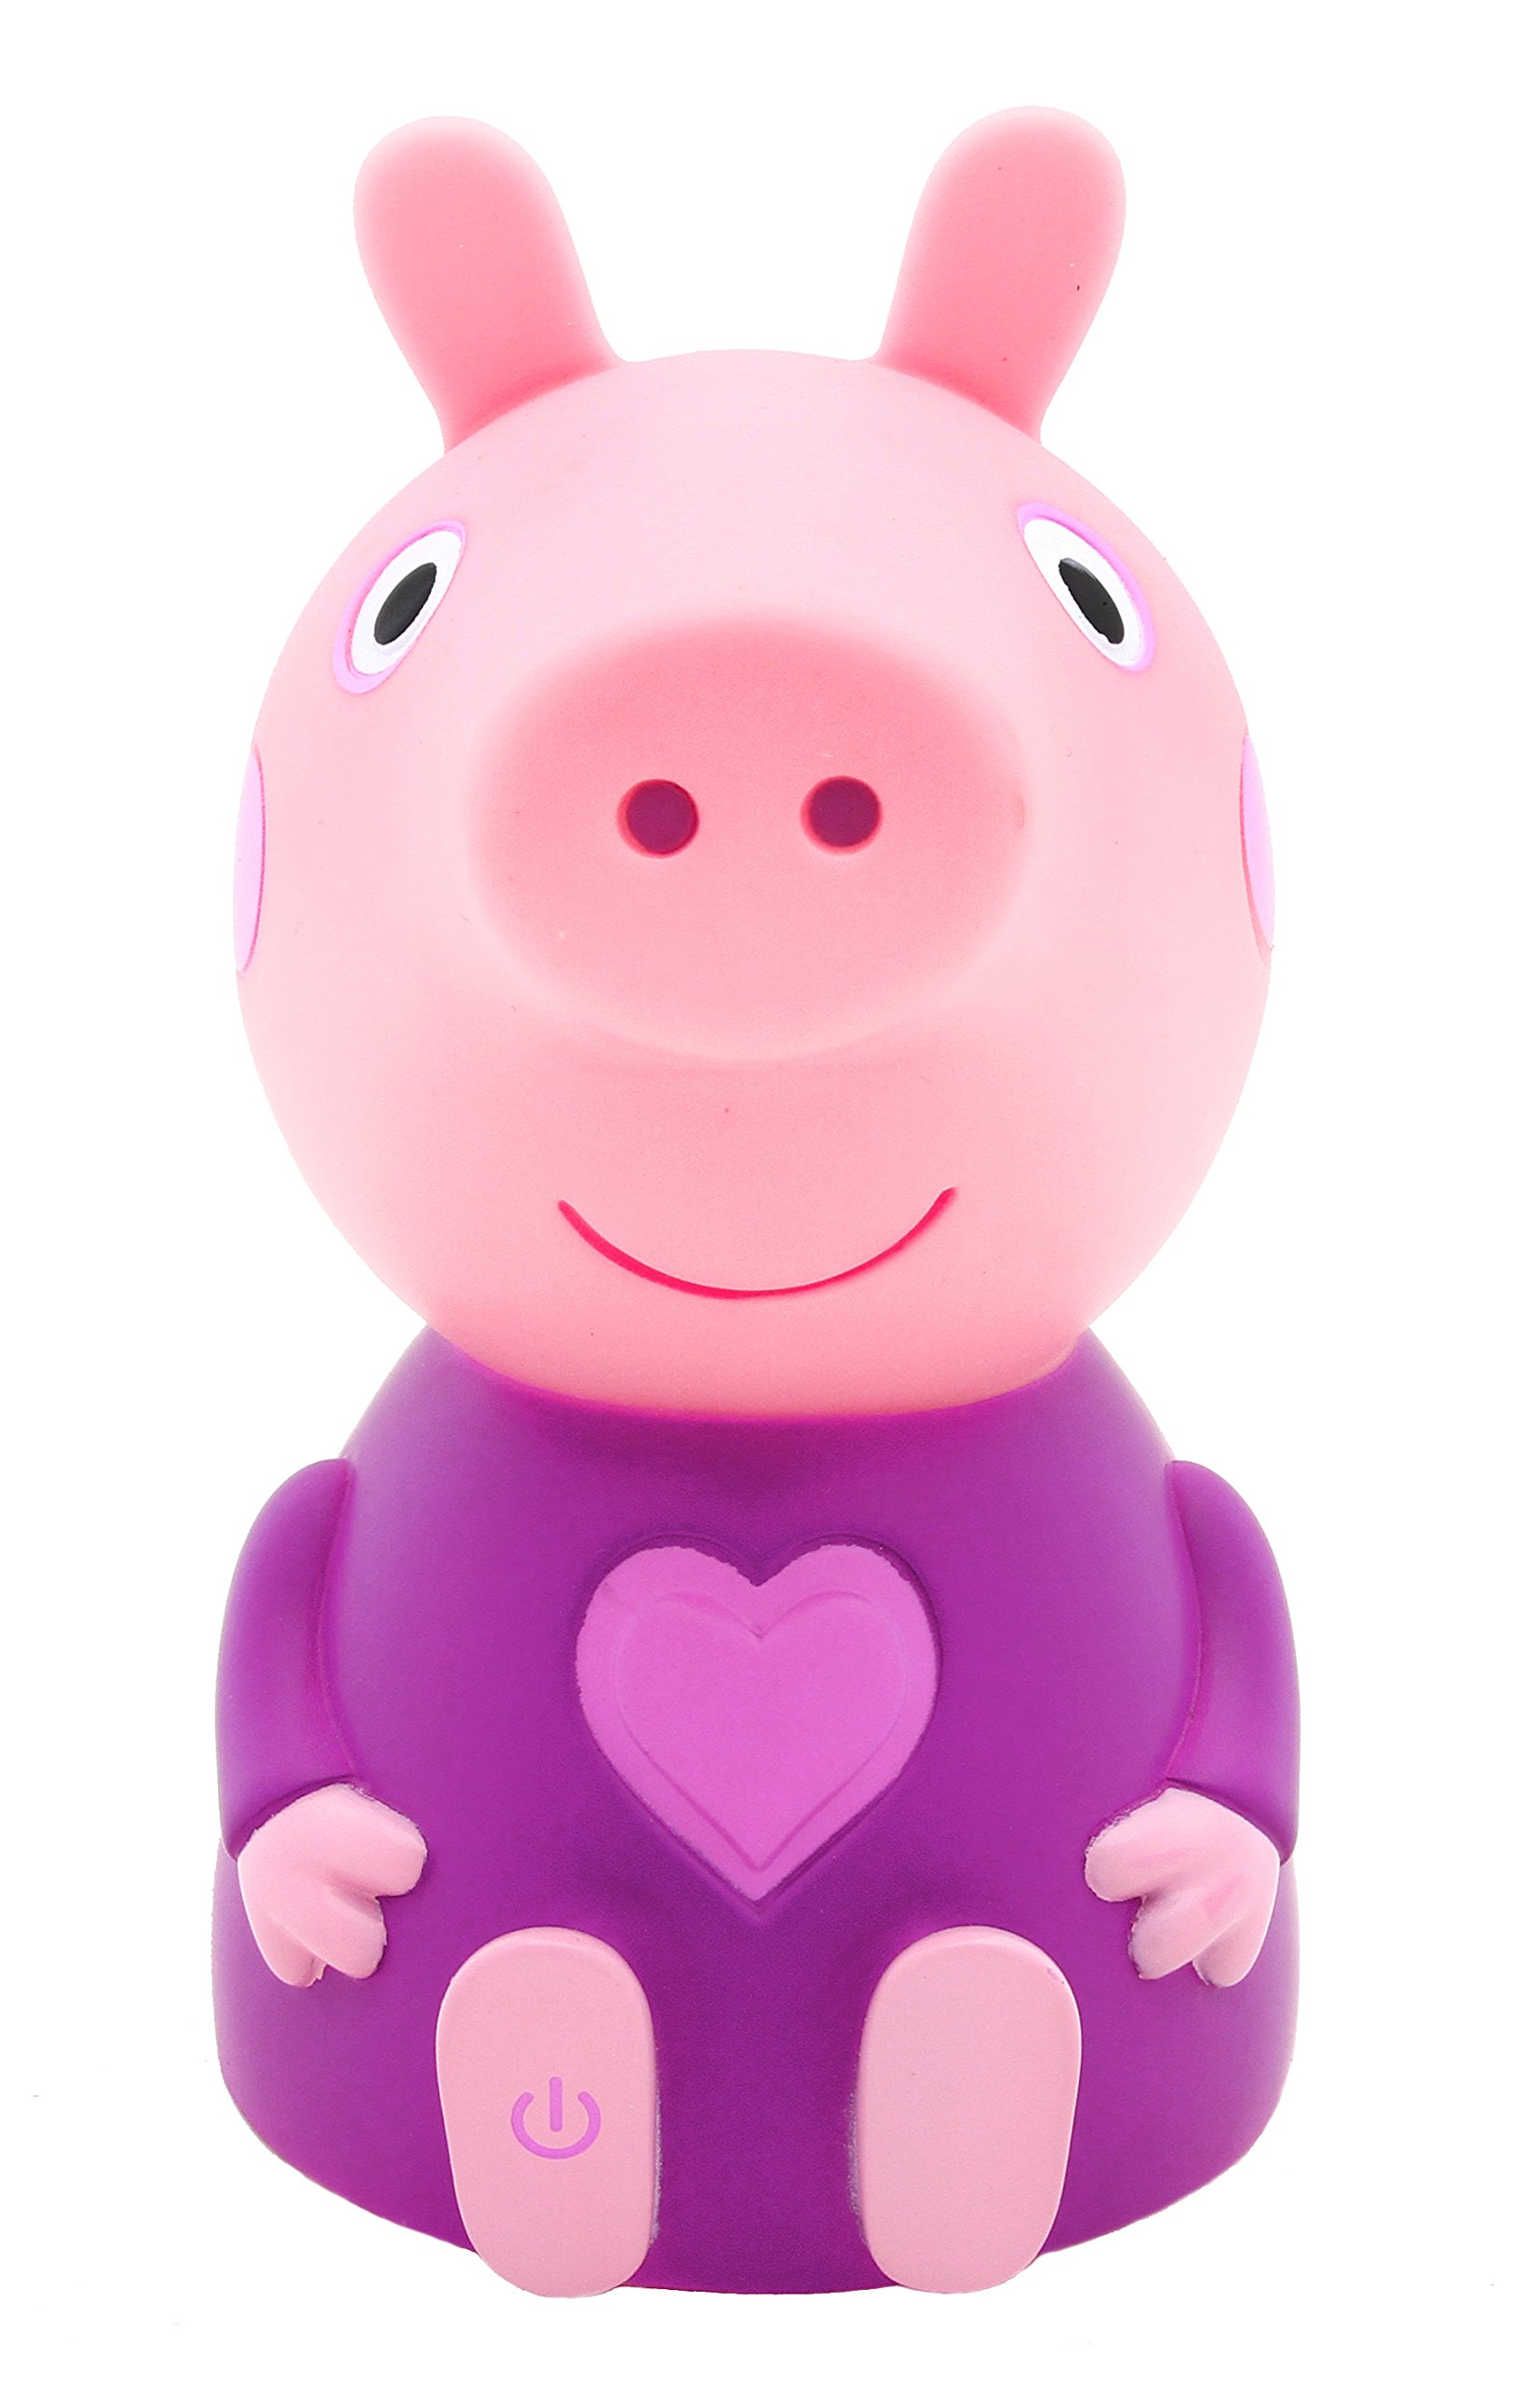 Peppa Pig Night Light - Peppa - Soft and Portable Light-Up Toy